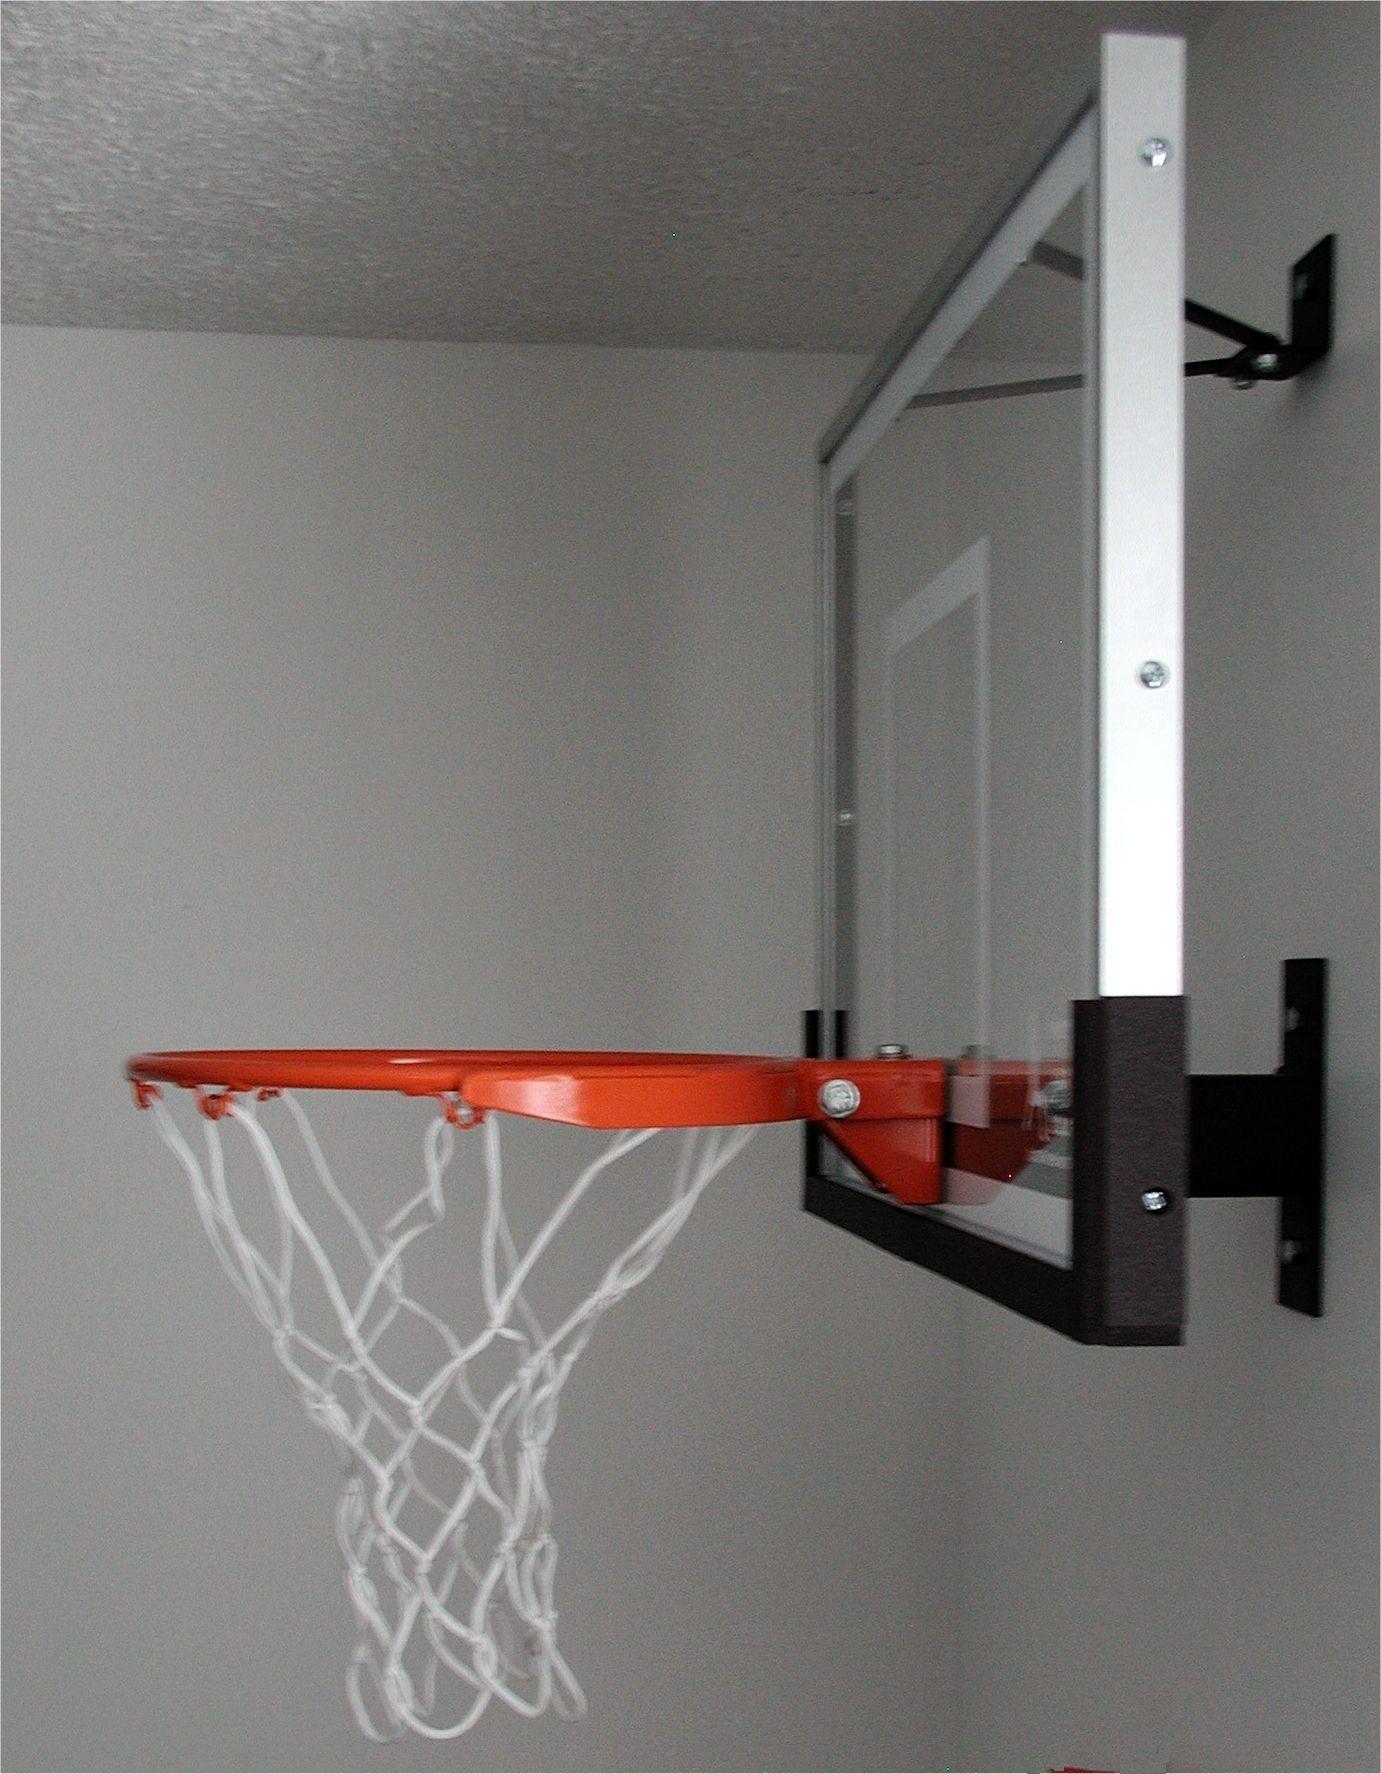 Indoor Basketball Hoop with Mini Basketball - MP 2.0 ...